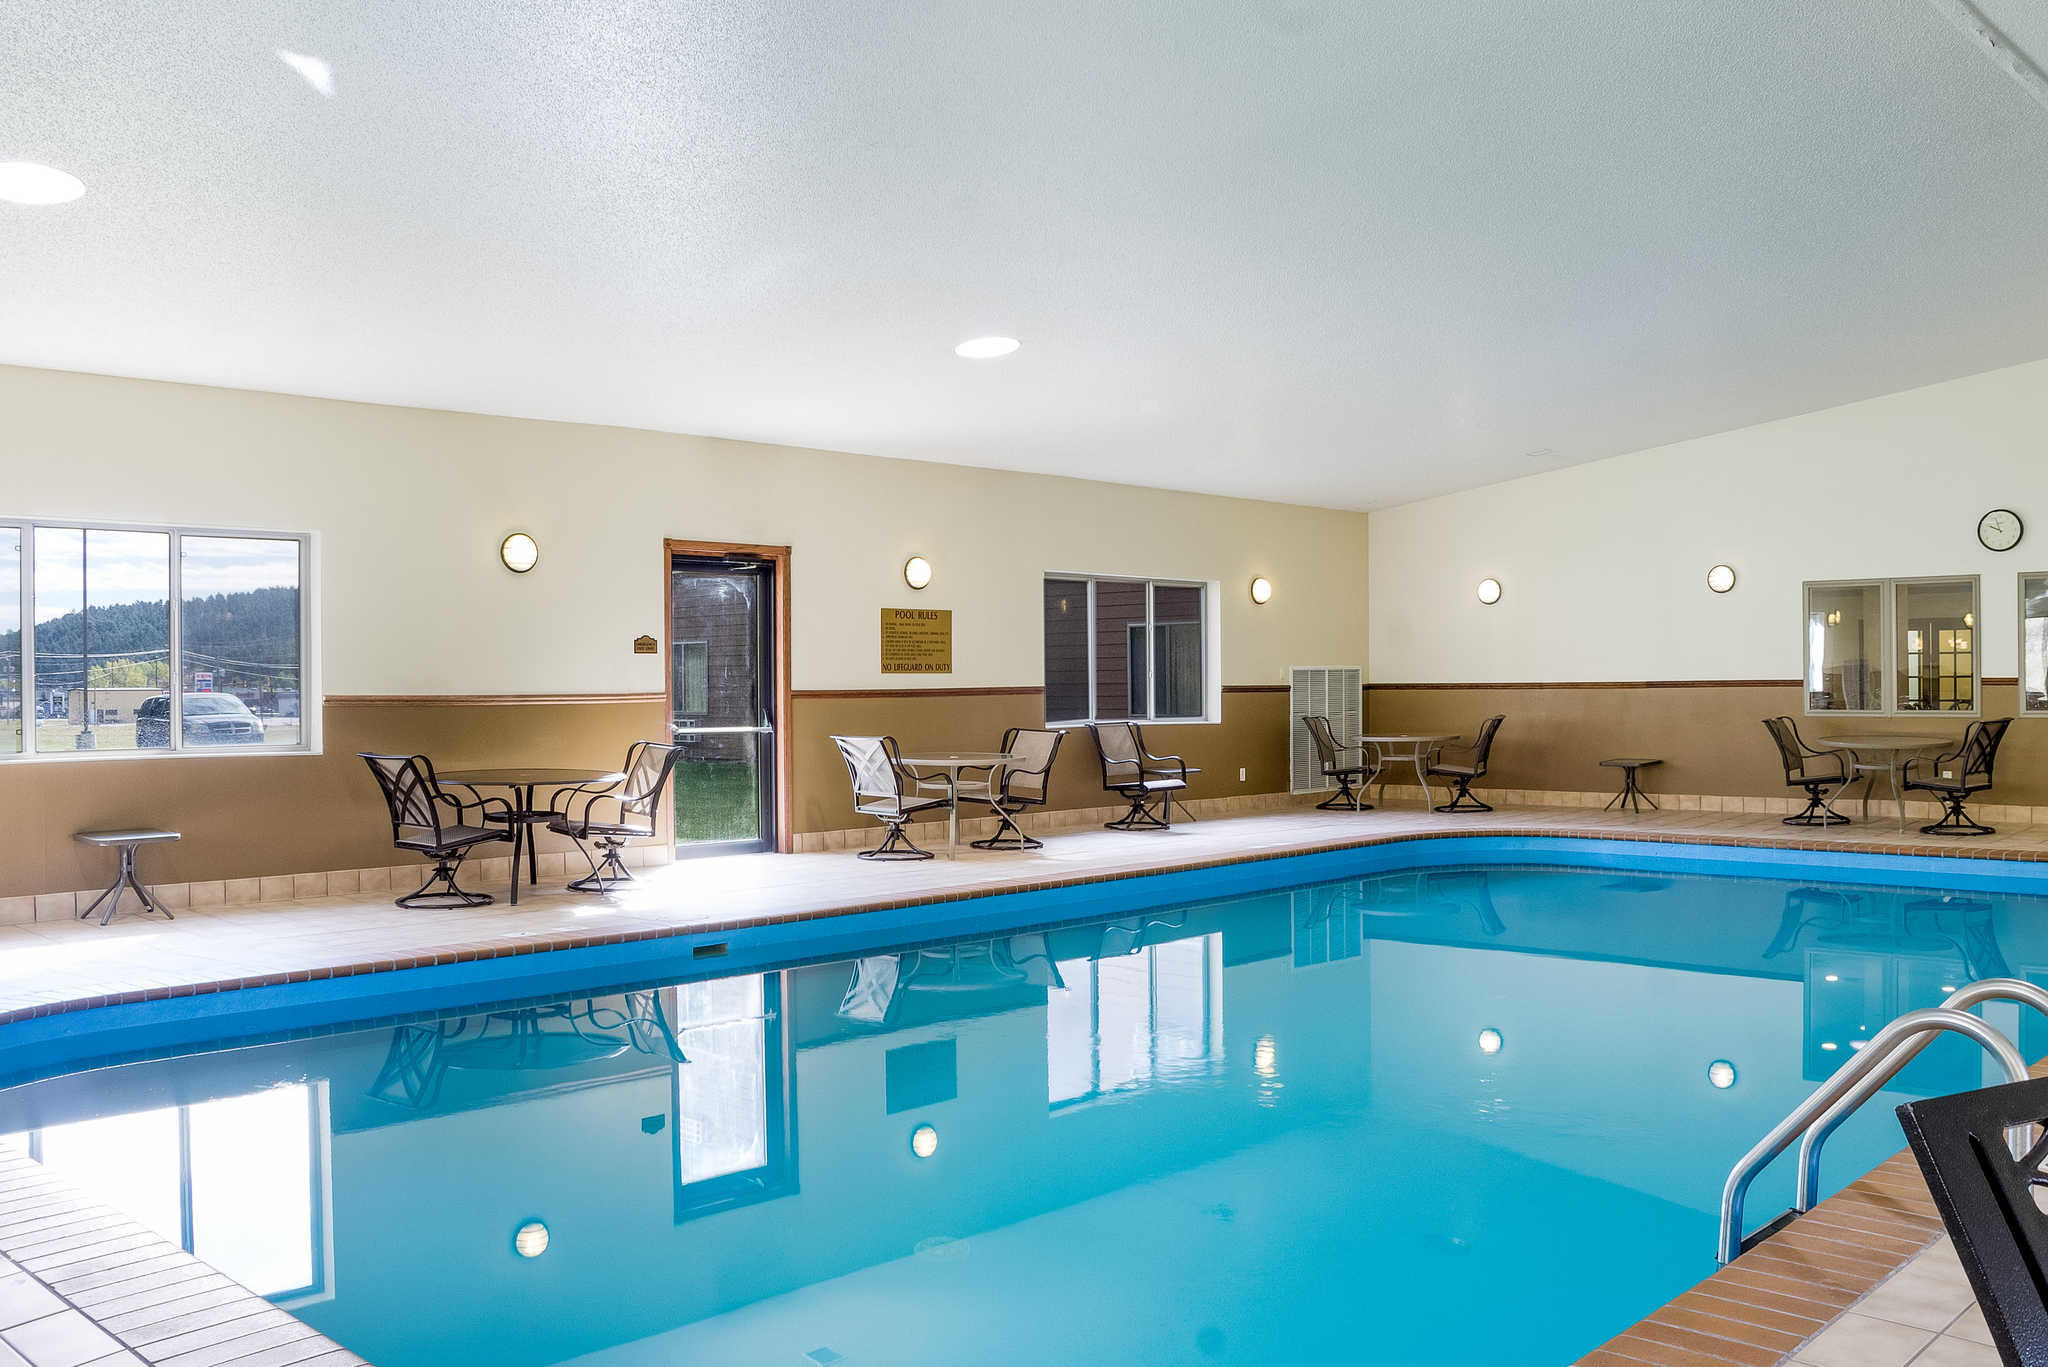 Comfort Inn & Suites image 41